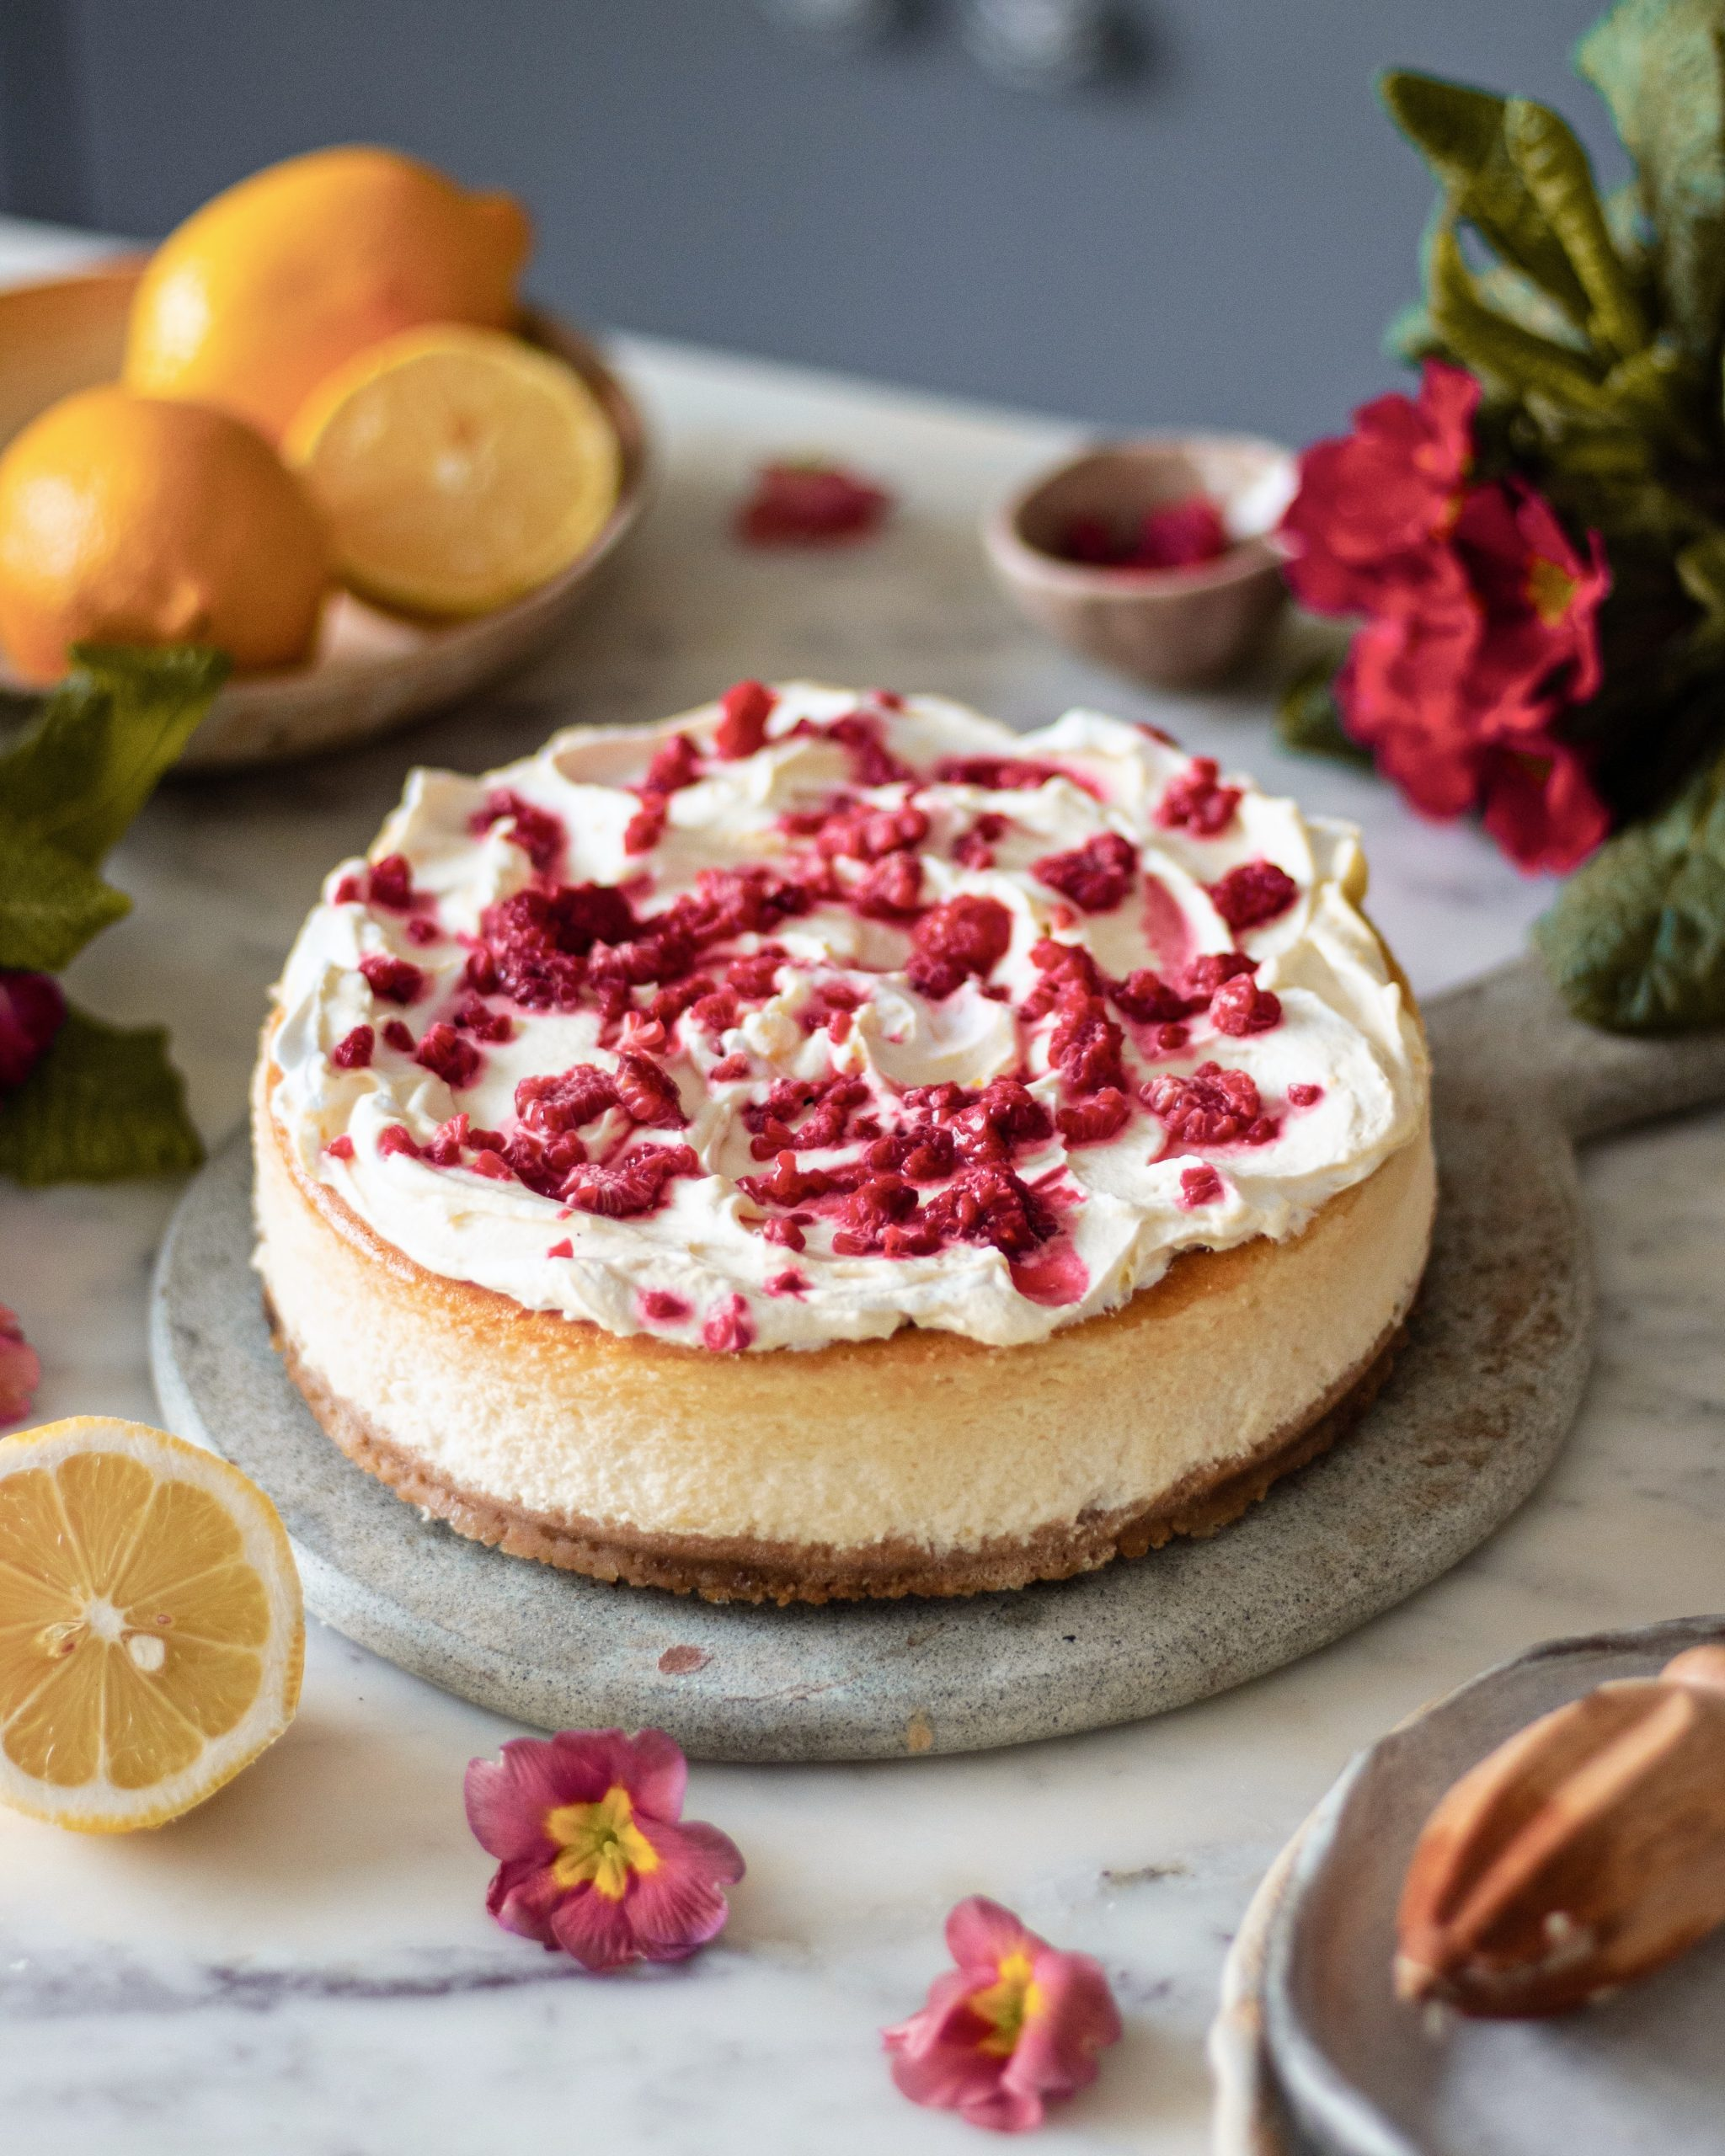 creamy cheese cake recipe